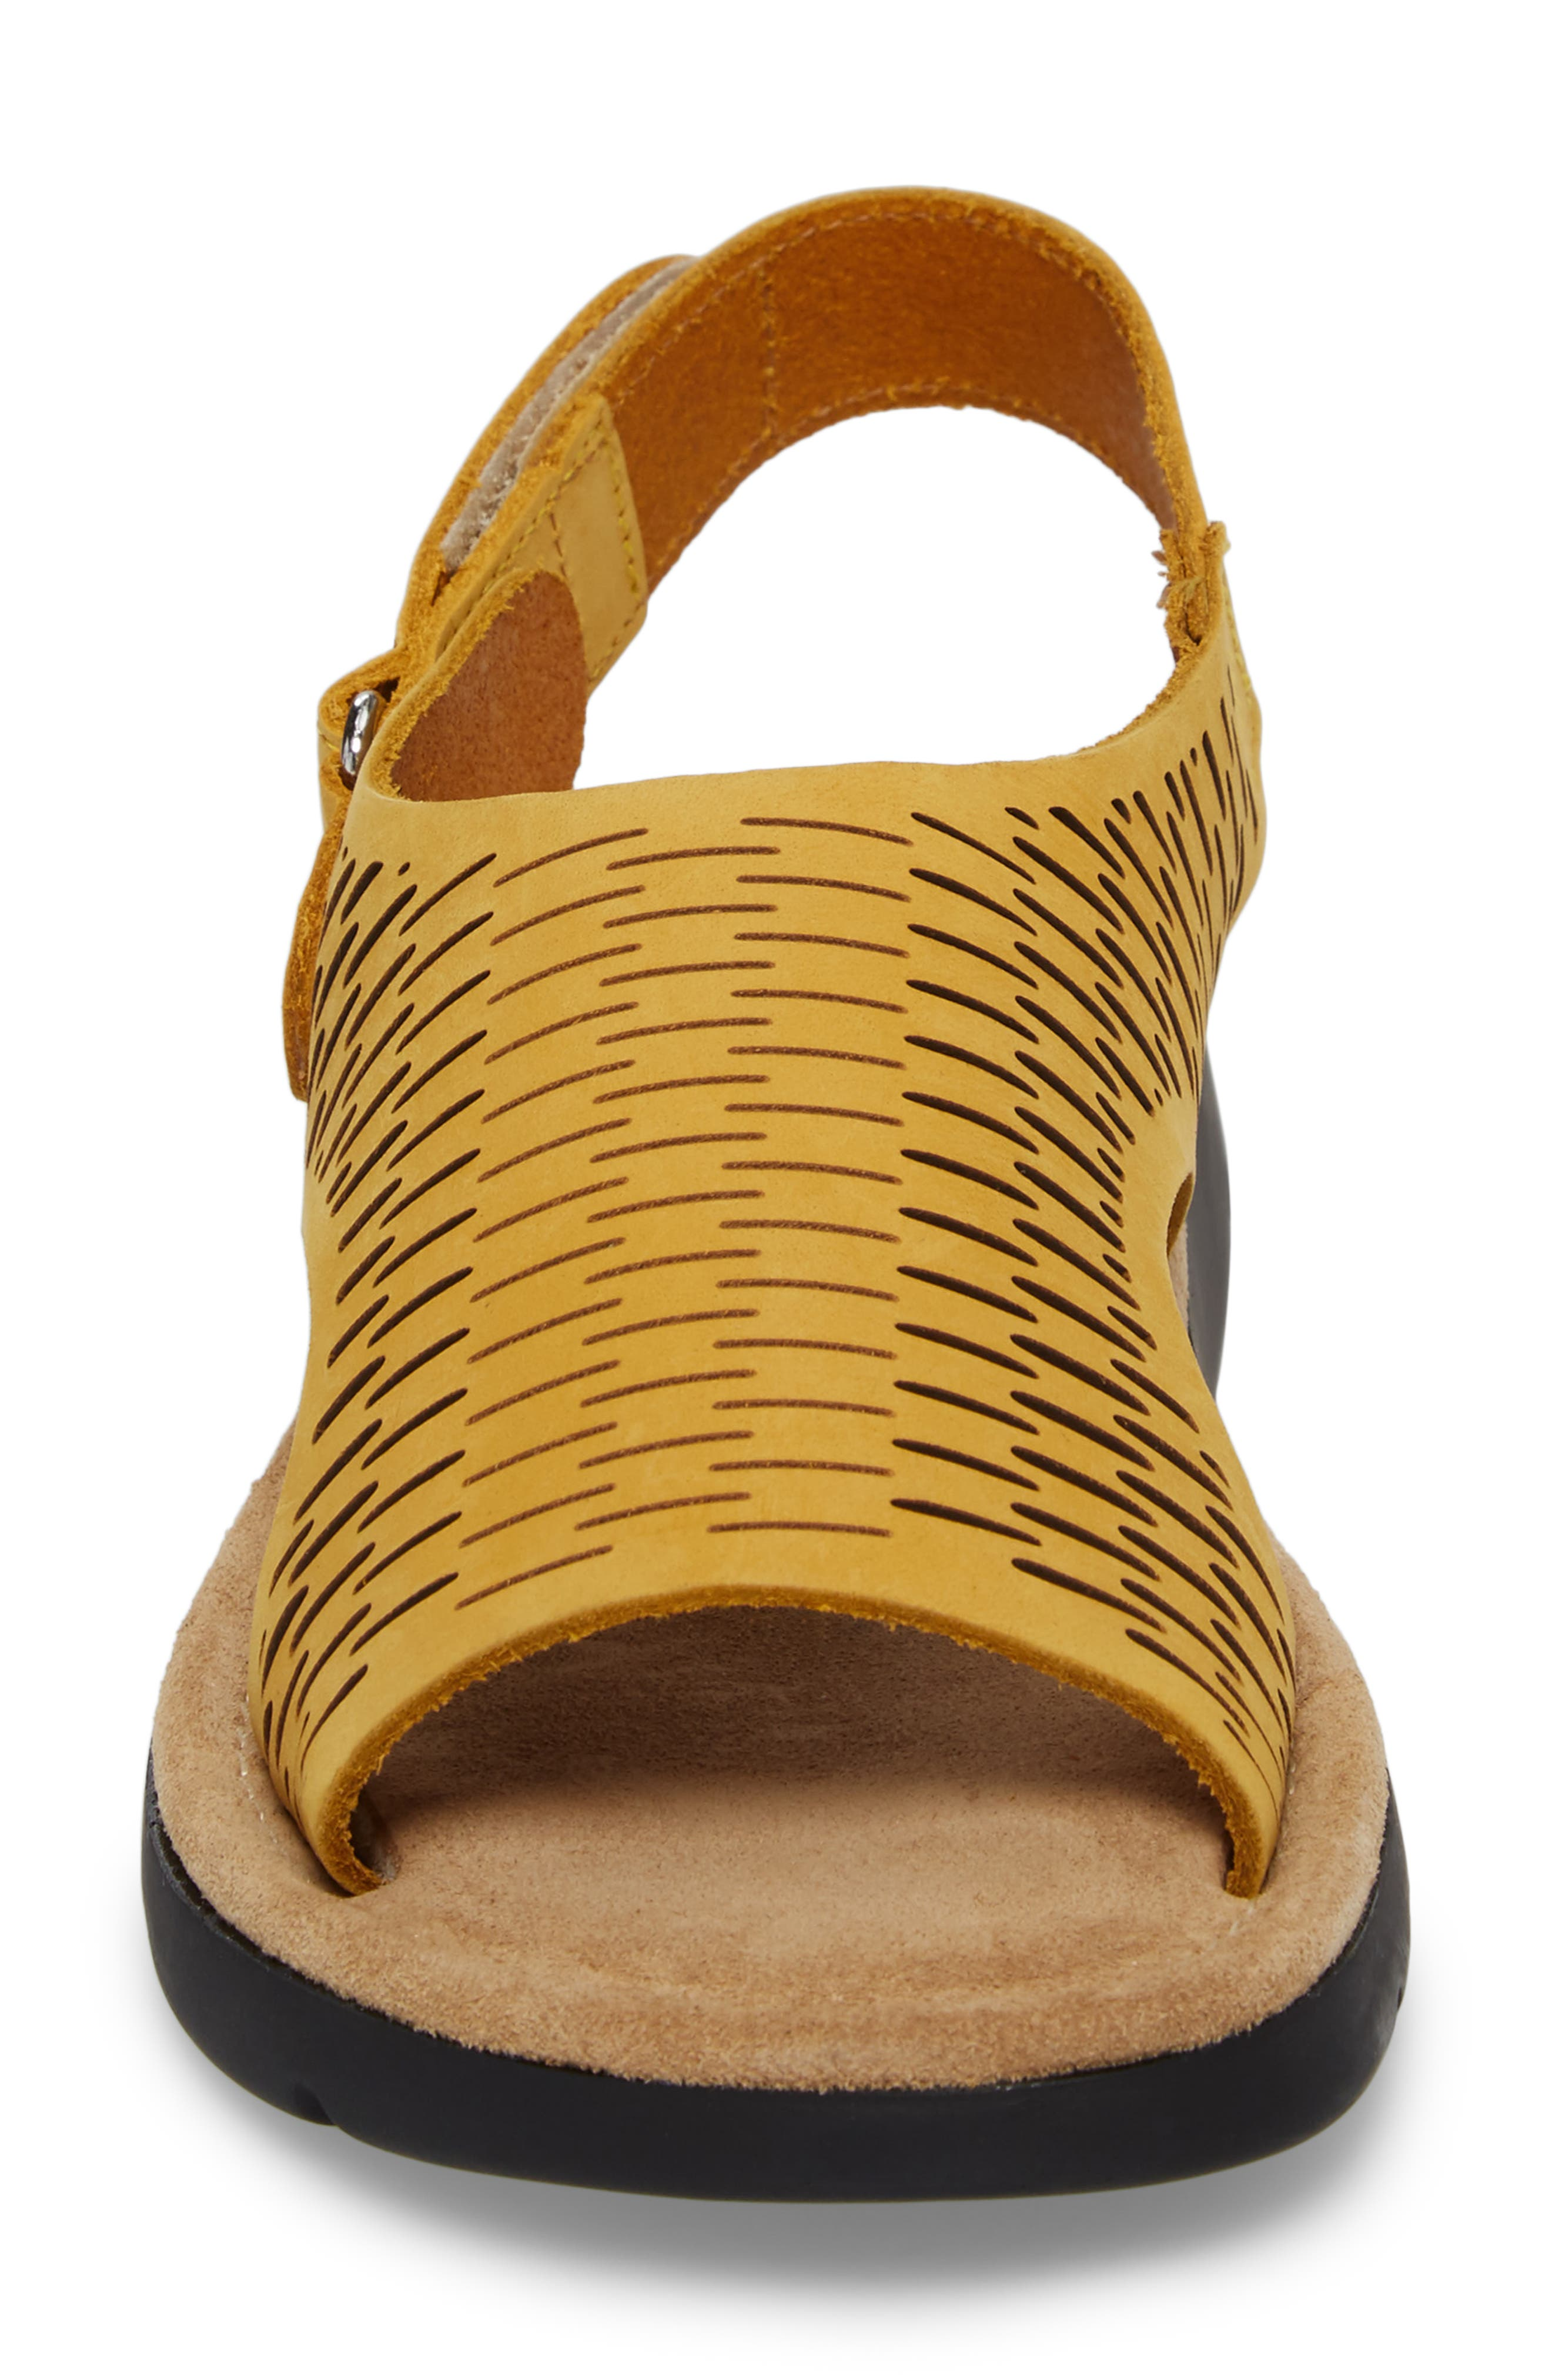 Saga Sandal,                             Alternate thumbnail 4, color,                             Mustard Nubuck Leather